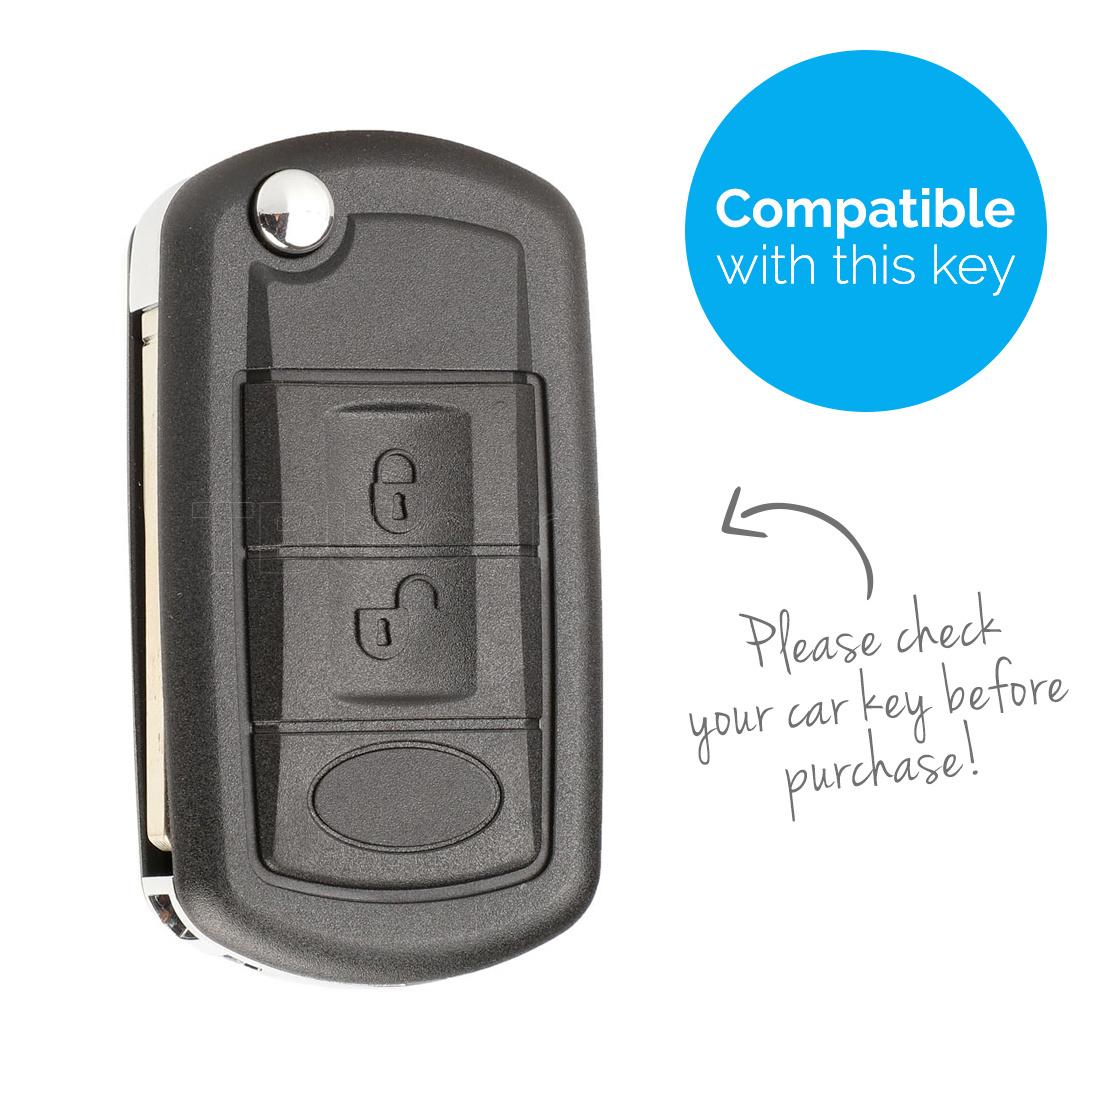 TBU car TBU car Sleutel cover compatibel met Land Rover - Silicone sleutelhoesje - beschermhoesje autosleutel - Blauw